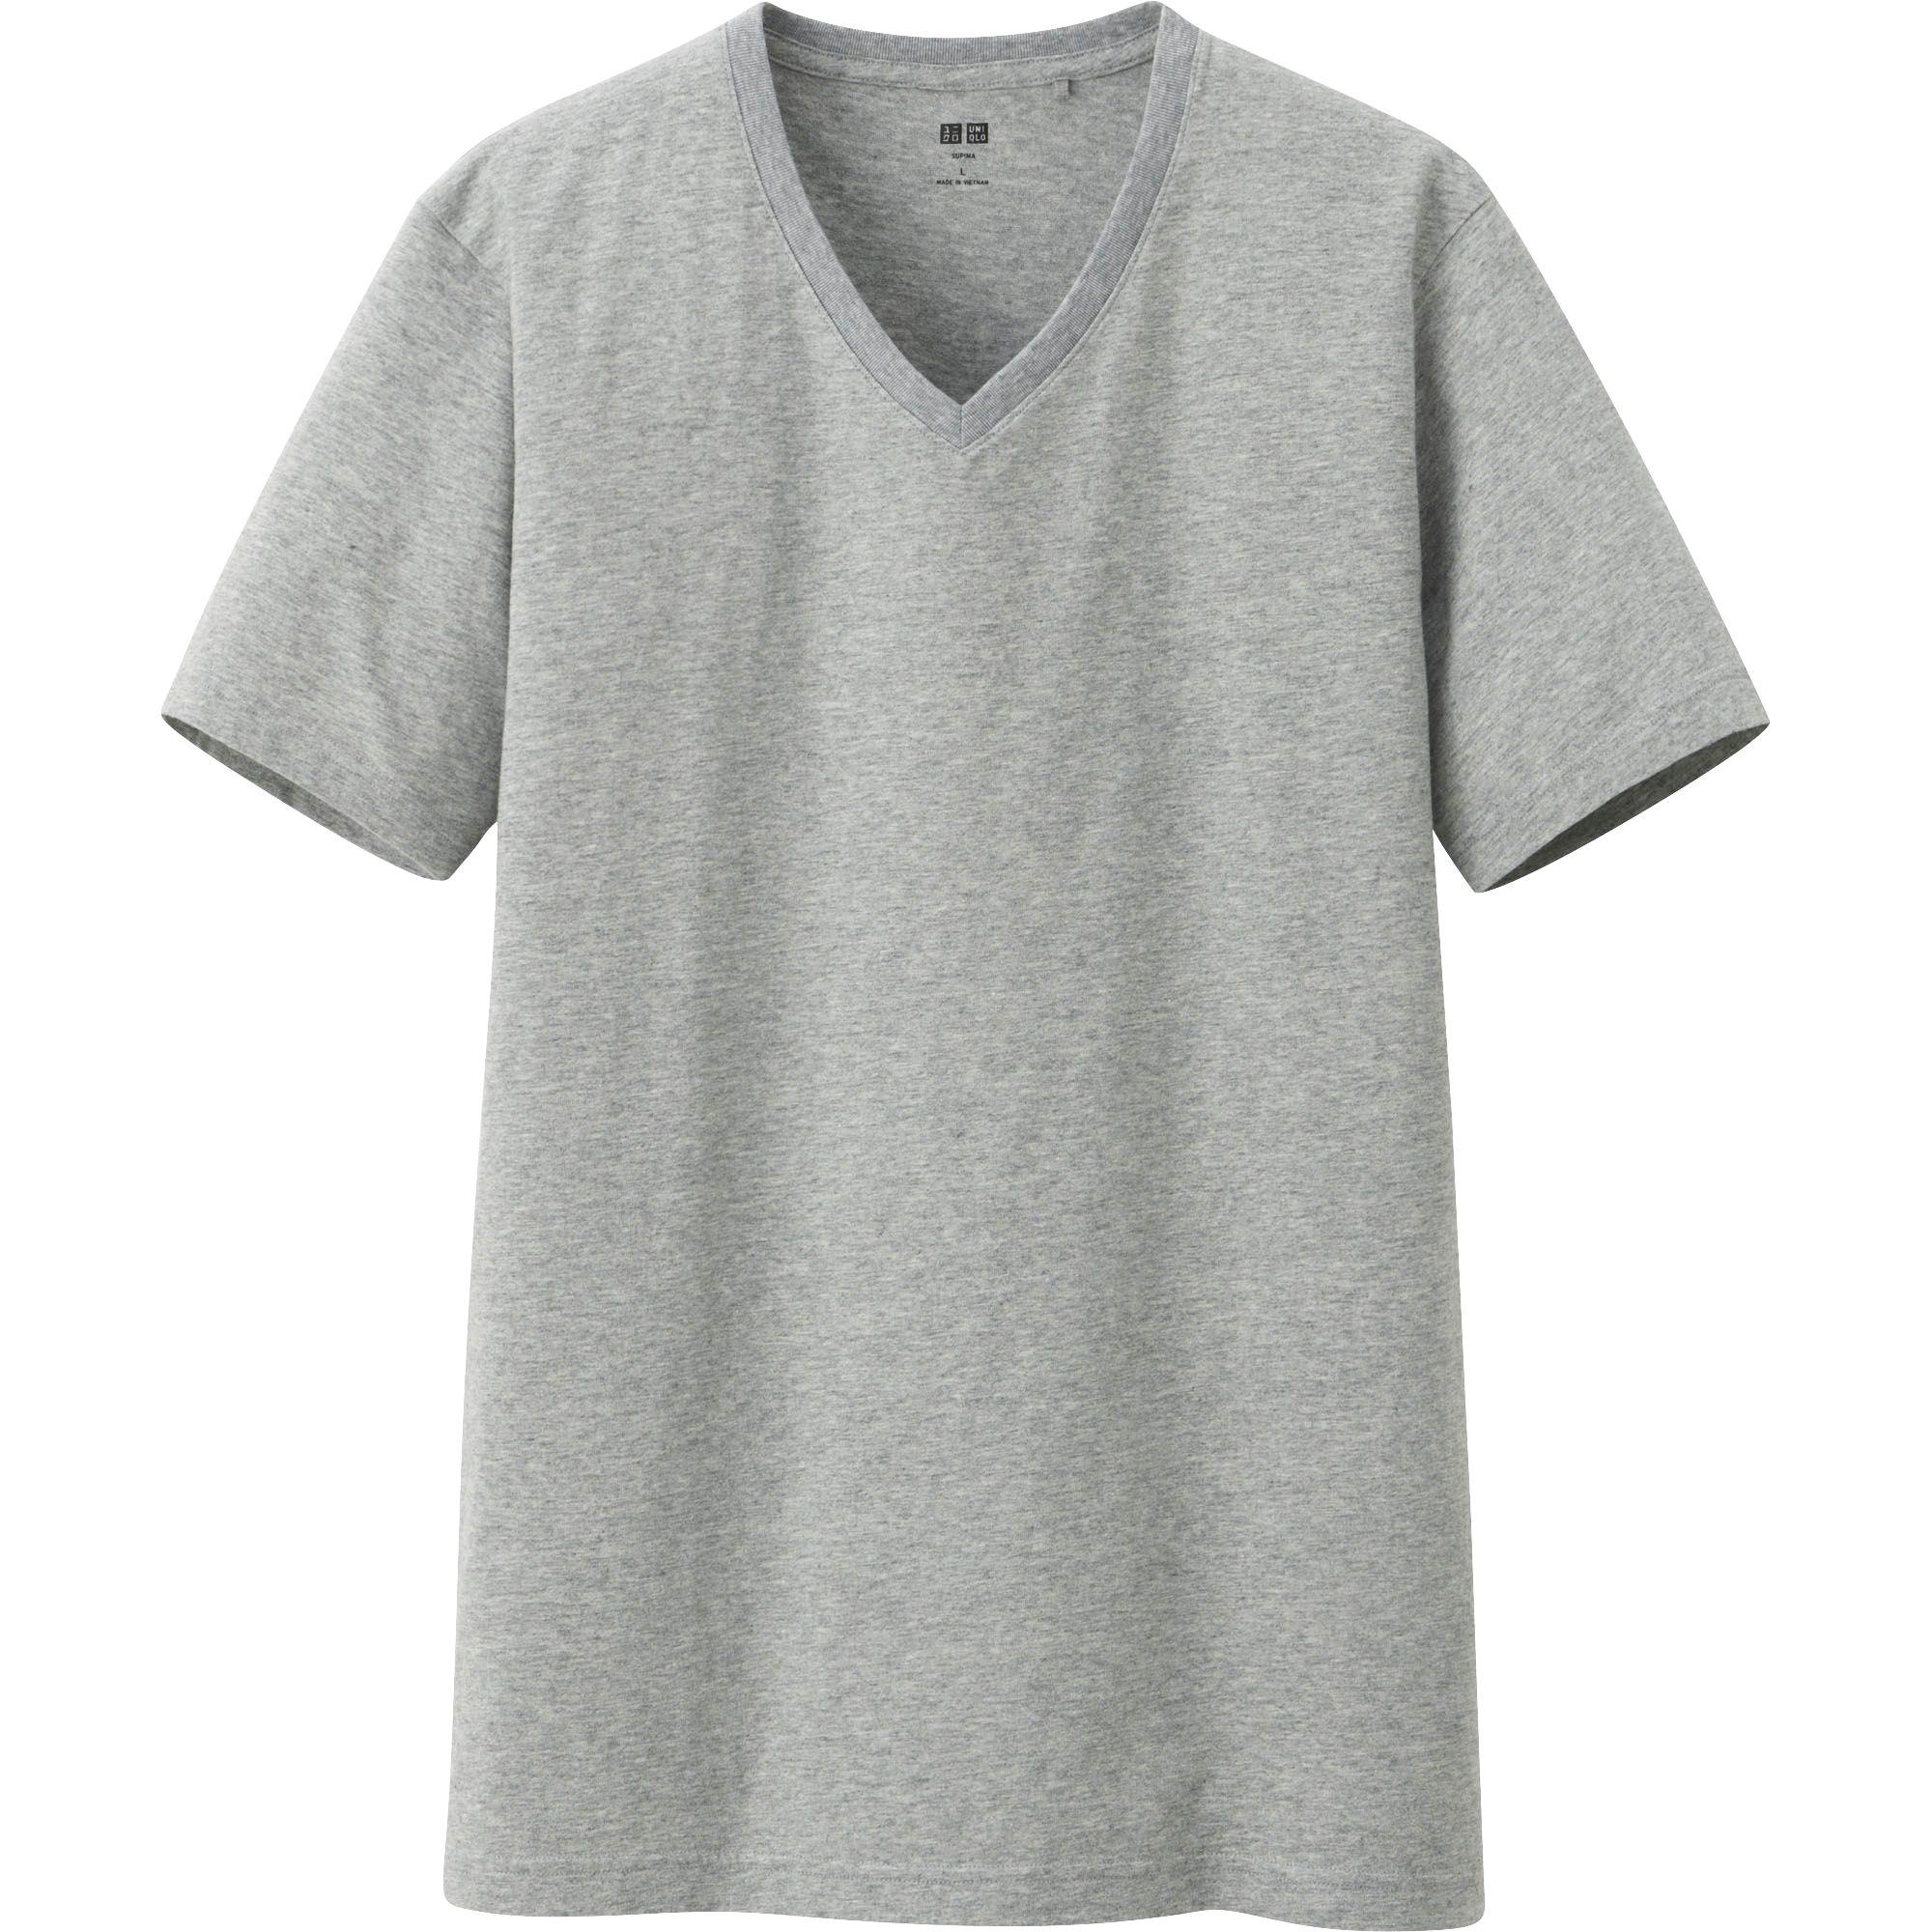 Uniqlo men supima cotton v neck short sleeve t shirt in for Supima cotton dress shirts